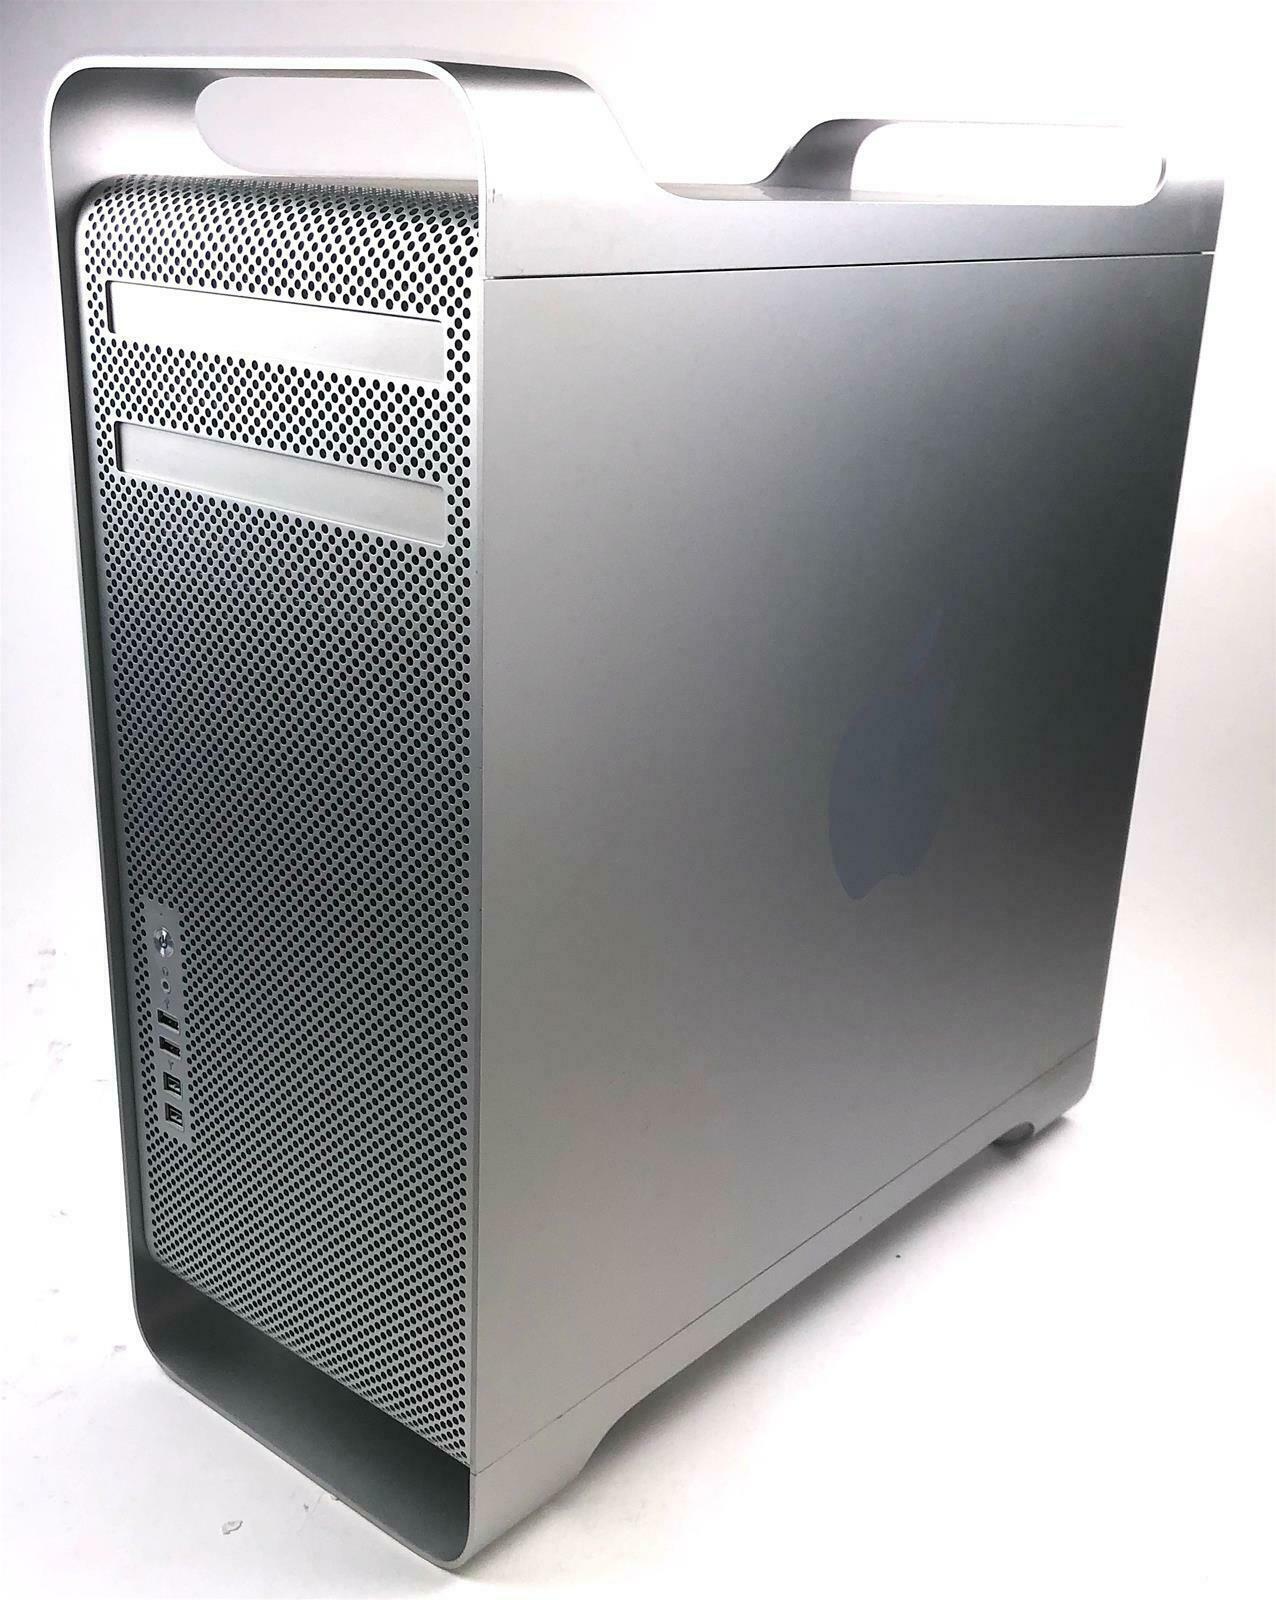 Equipo Apple Mac Pro 5.1 / Una CPU / 48Gb Ram / 1Tb. HDD